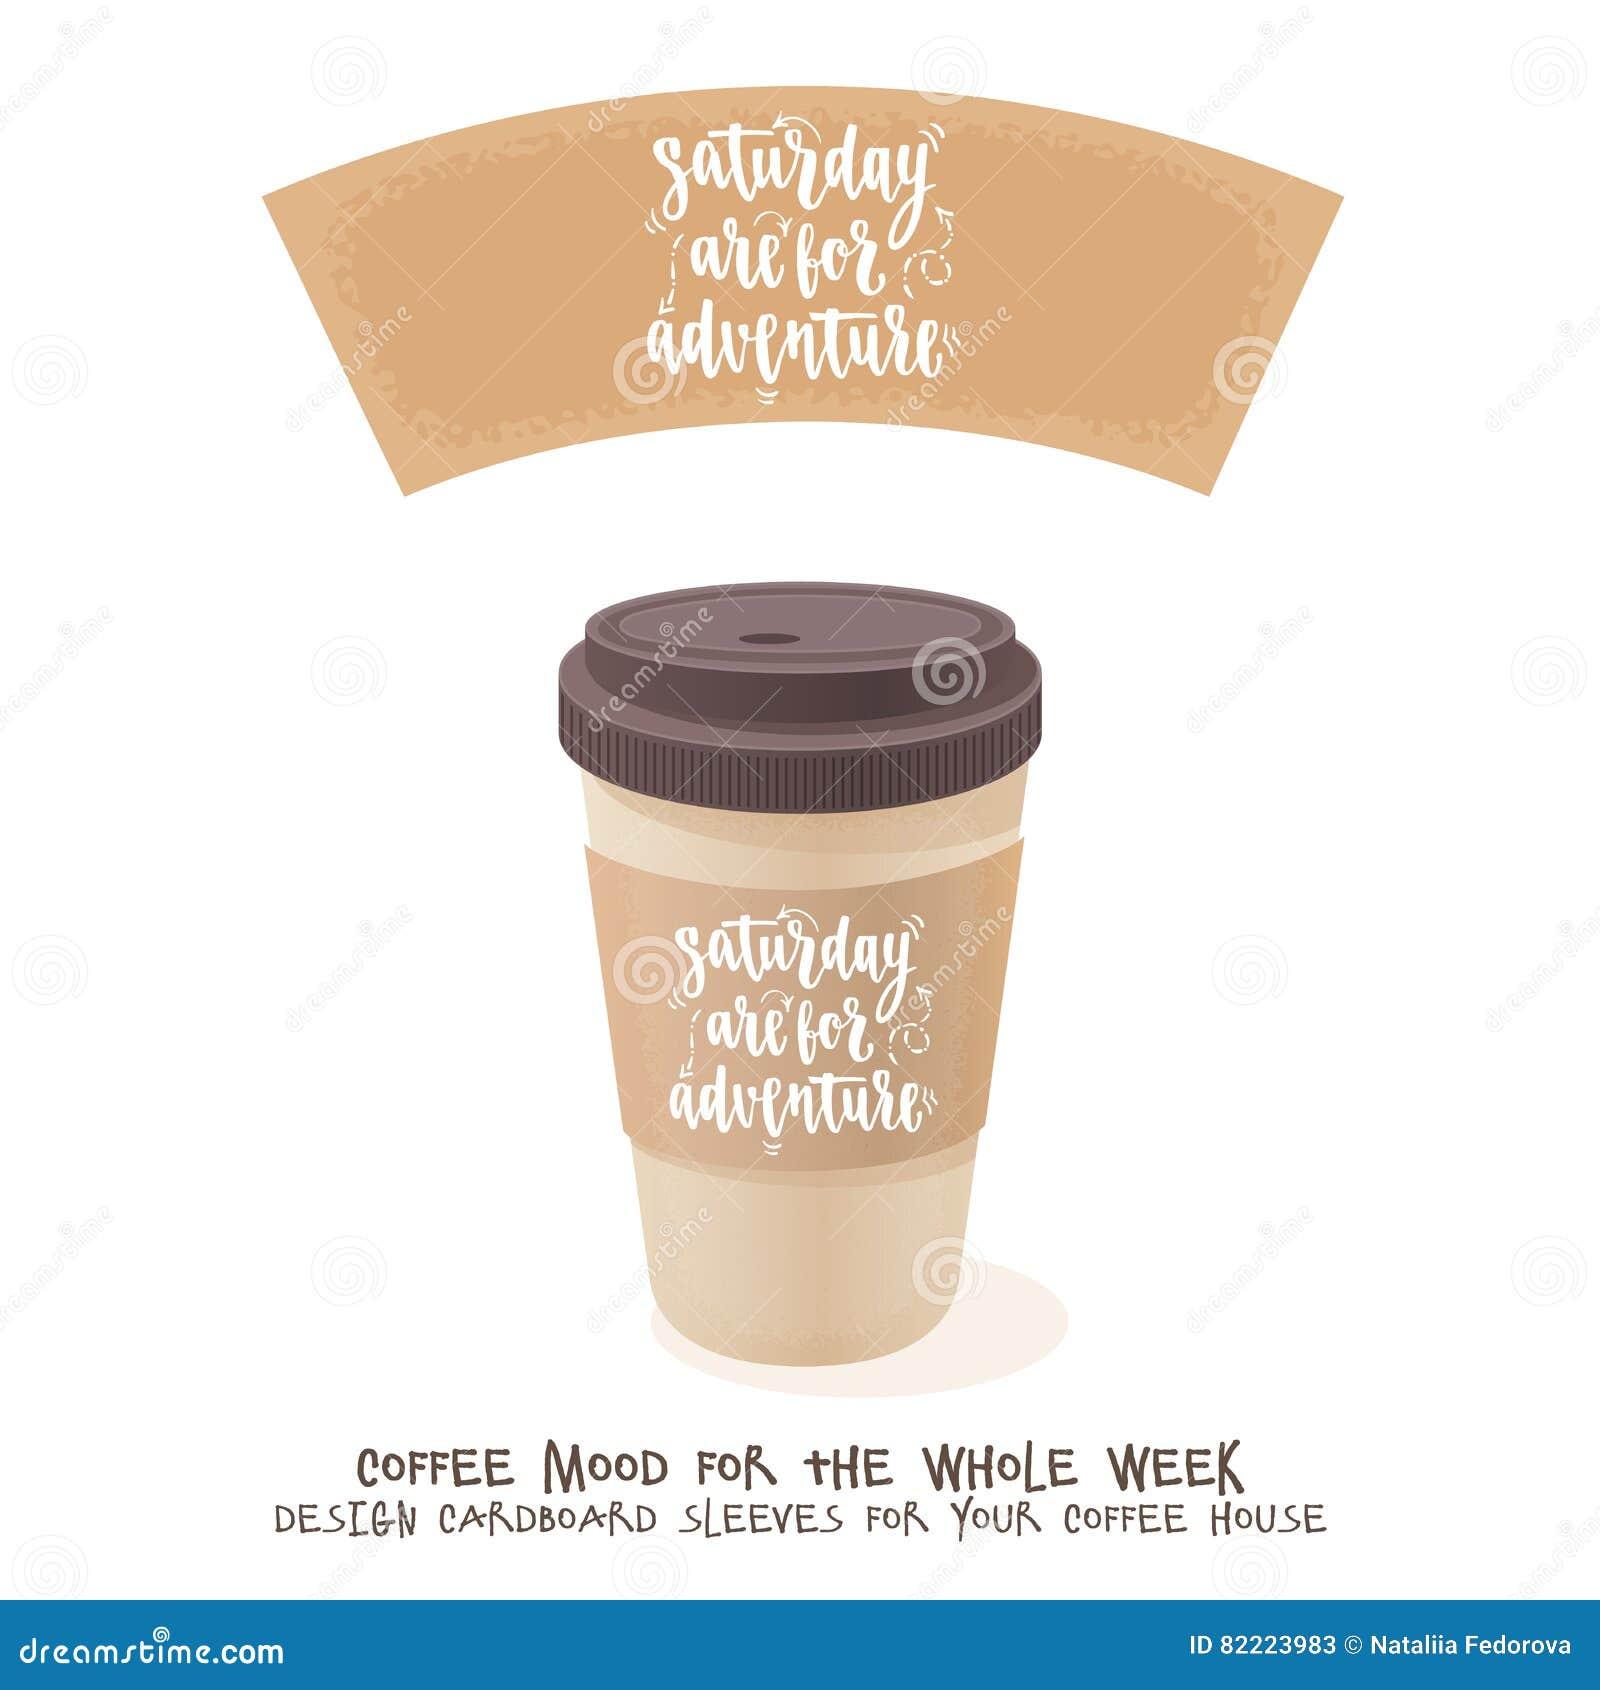 coffee cardboard sleeve week days motivation quotes saturday